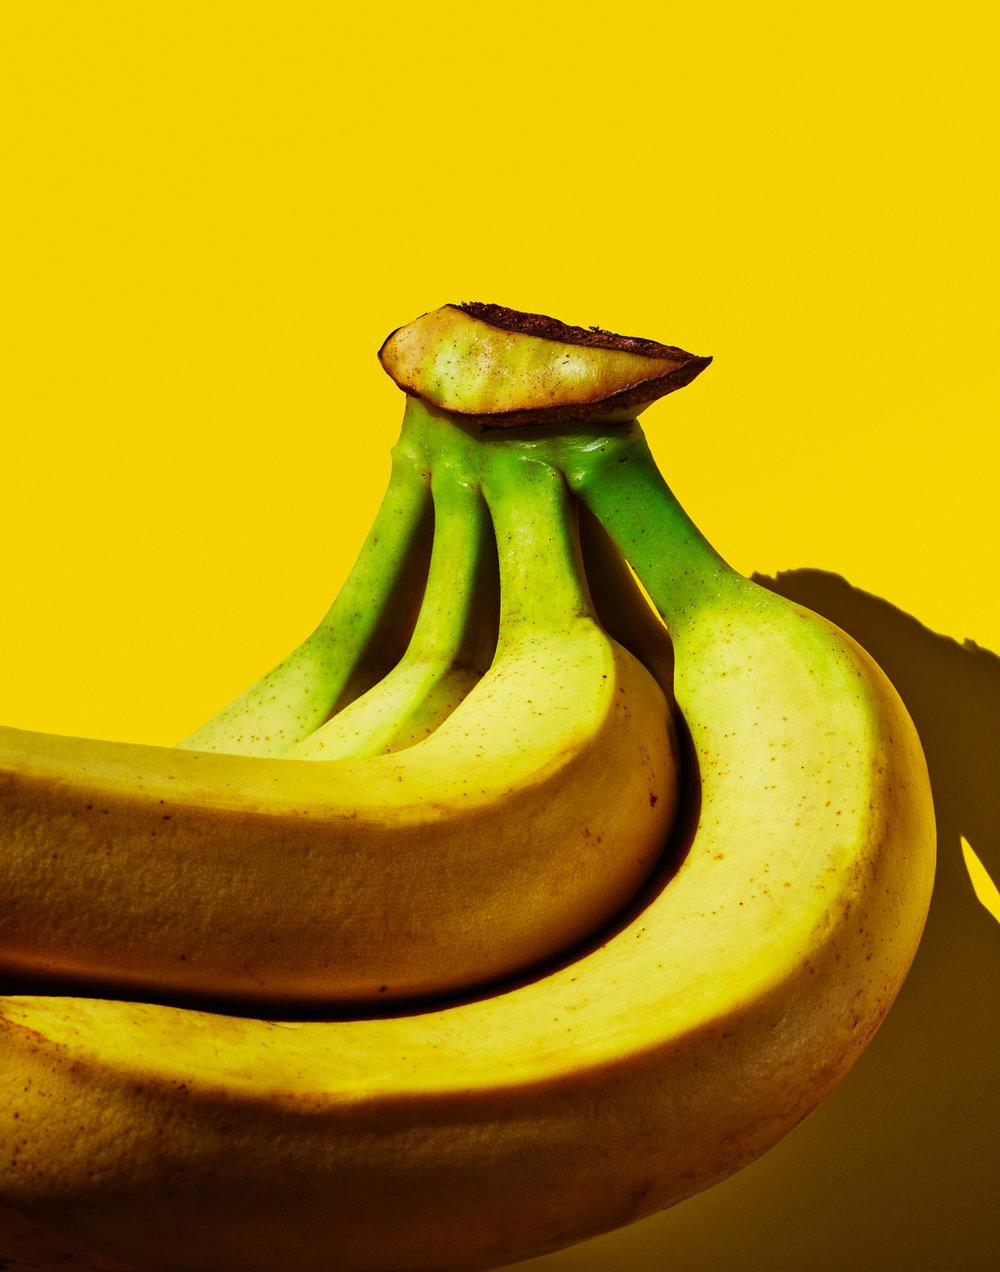 141022 Fruit Banana A.jpg